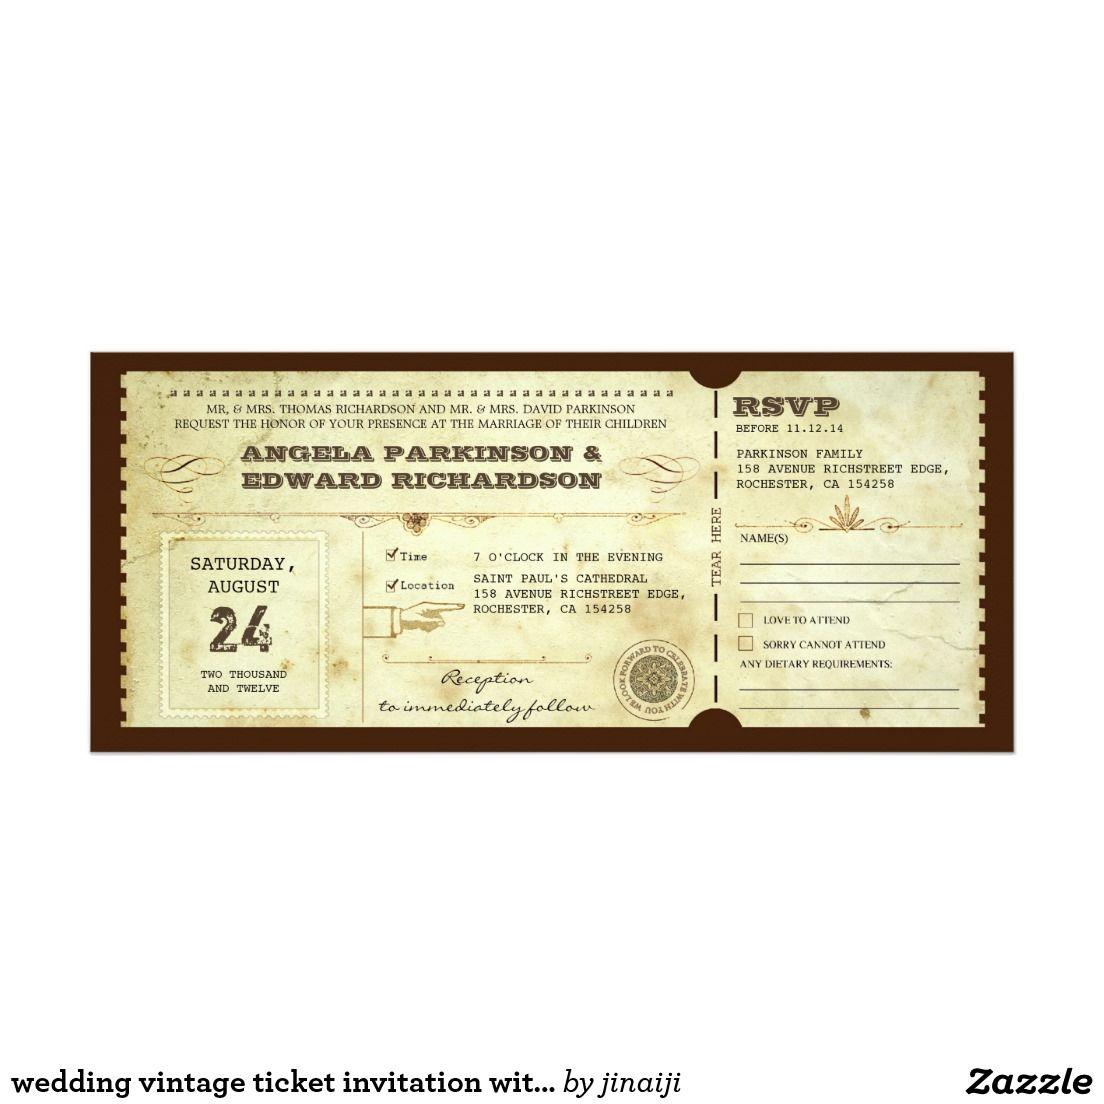 wedding vintage ticket invitation with rsvp design vintage wedding